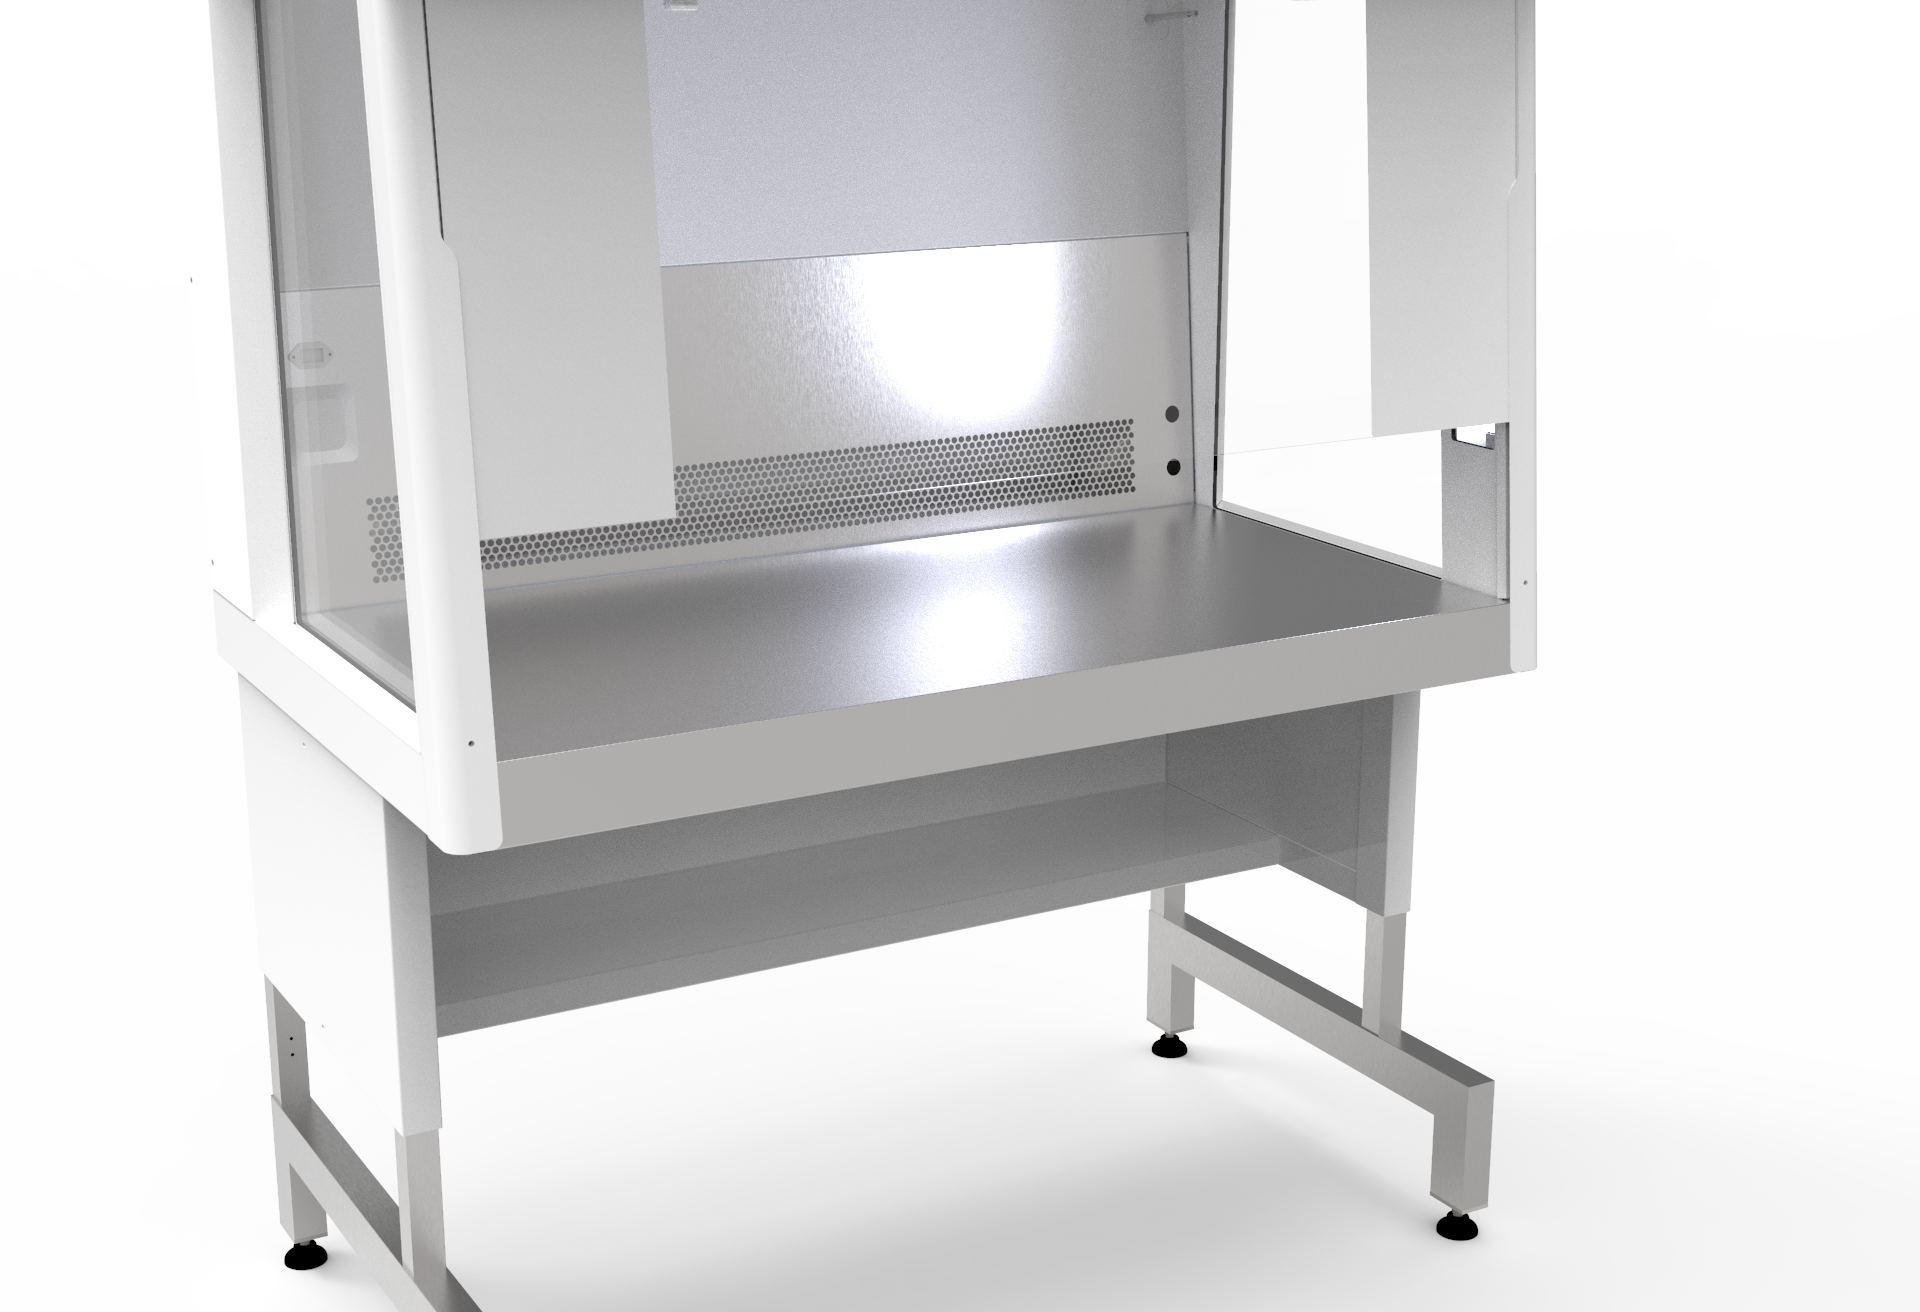 Cleanwizard V 130 laminar flow cabinet